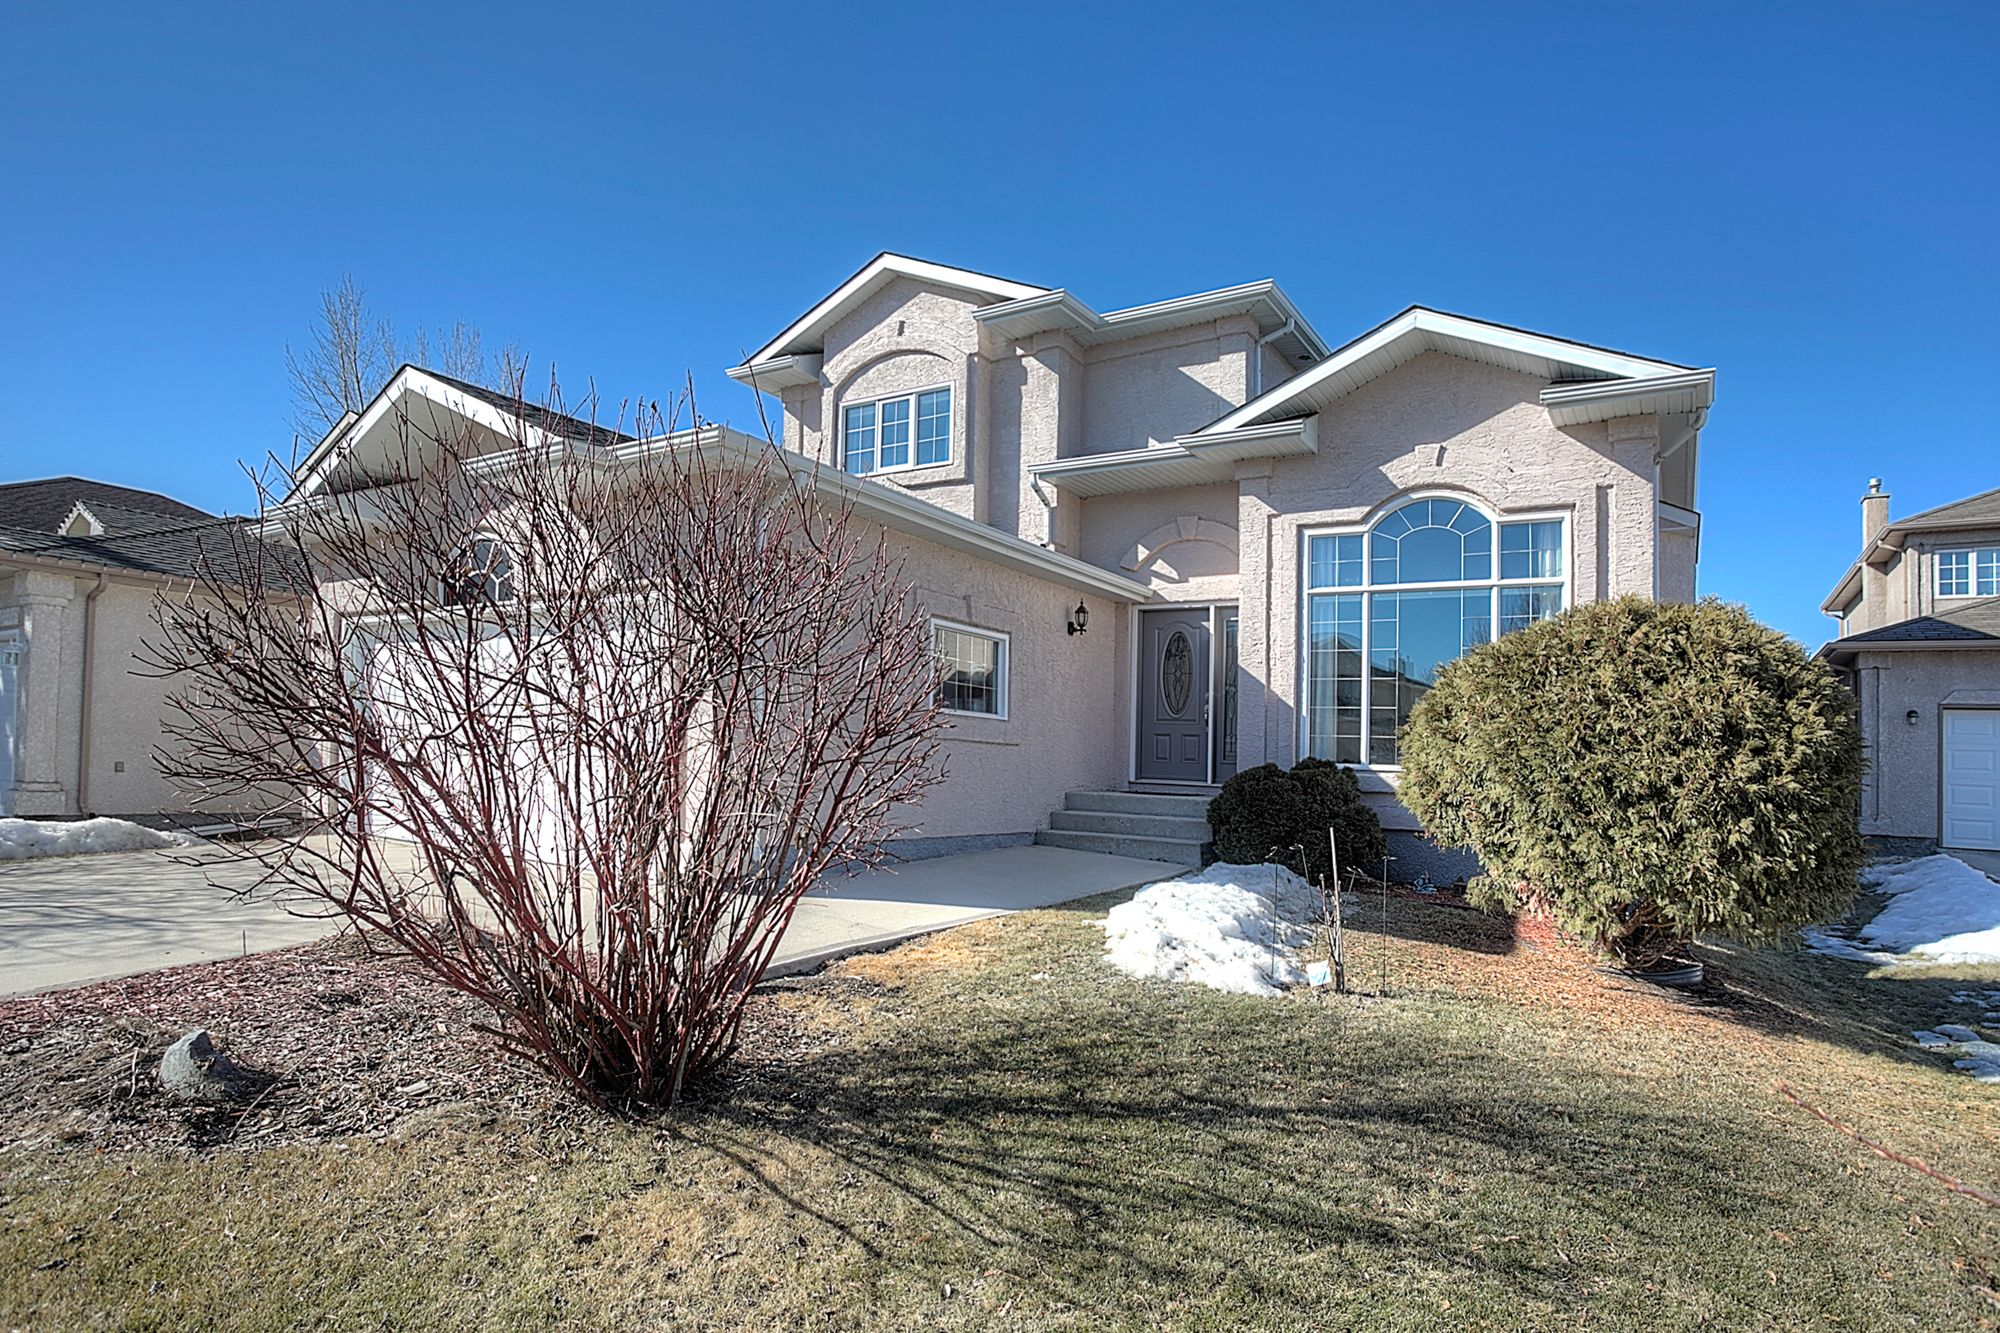 Main Photo: 55 Beacon Hill in Winnipeg: Whyte Ridge Single Family Detached for sale (1P)  : MLS®# 1908677